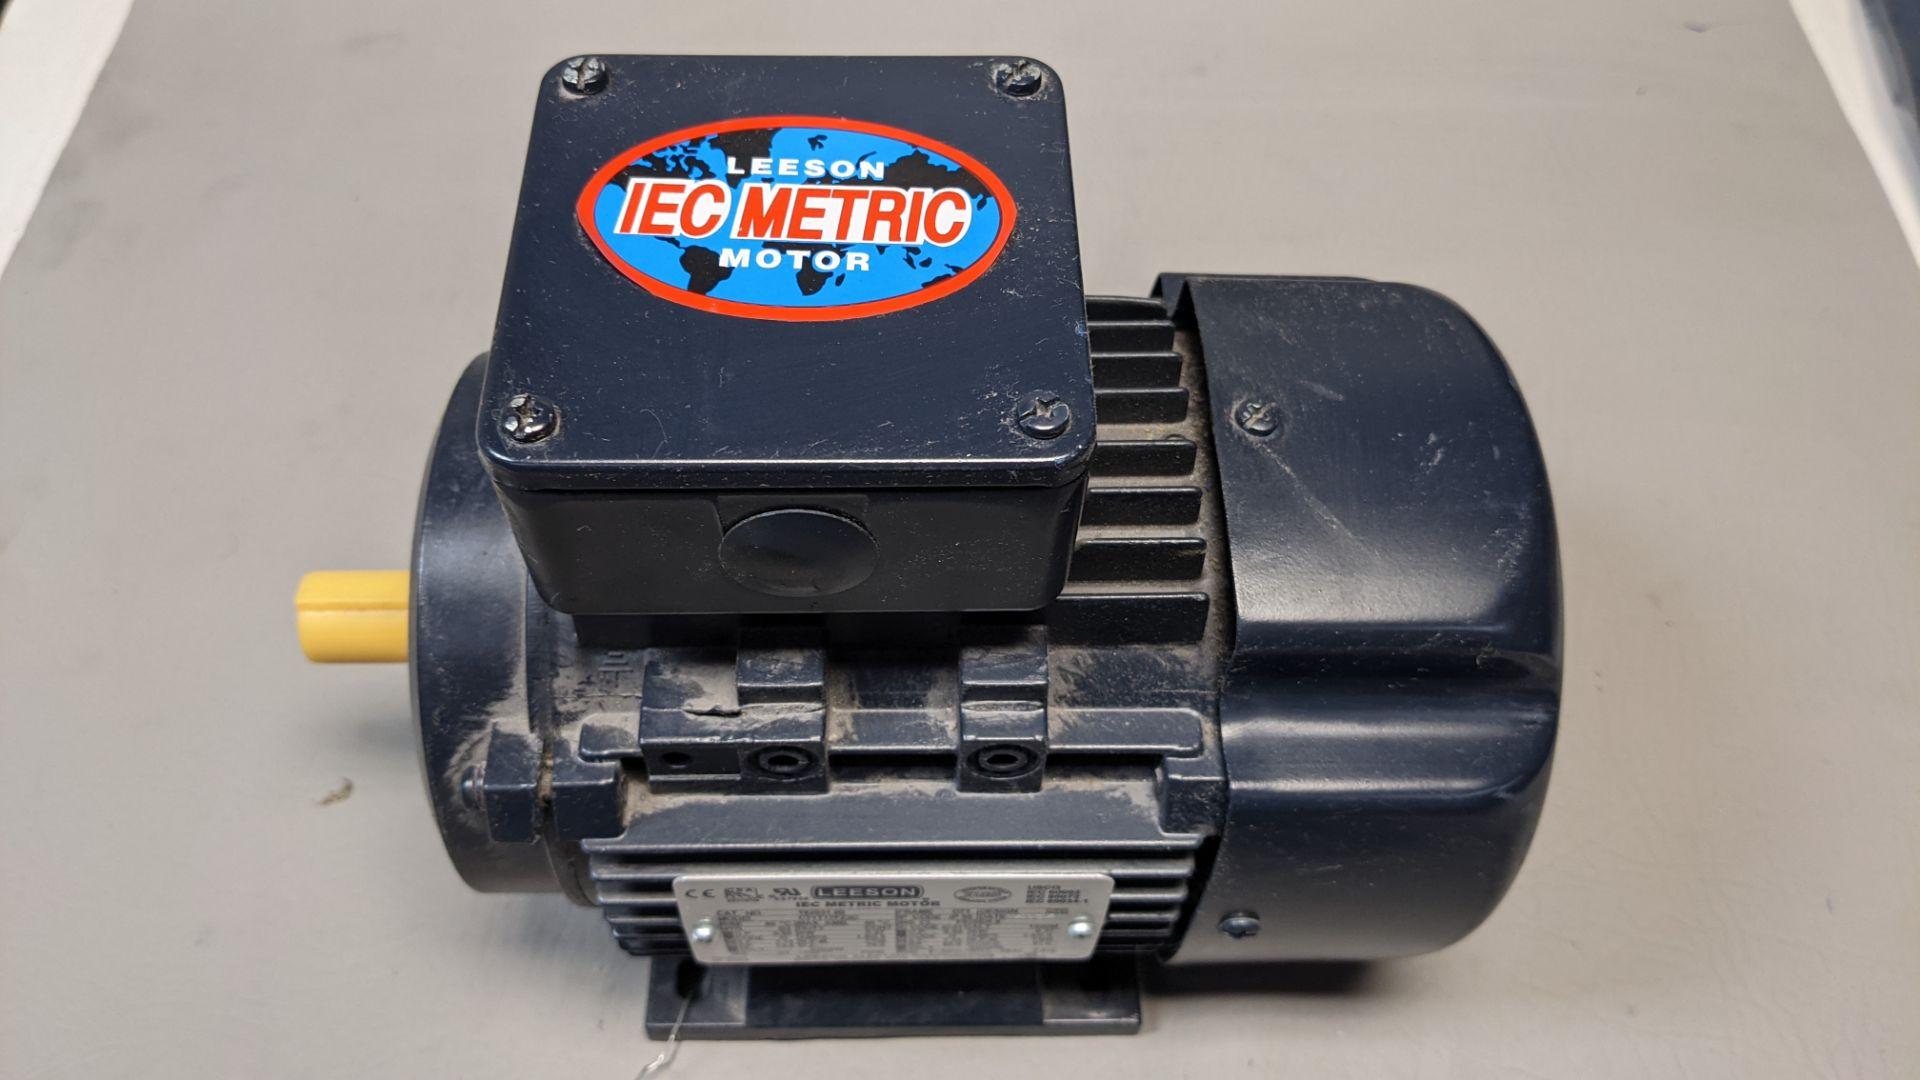 UNUSED LEESON IEC METRIC MOTOR